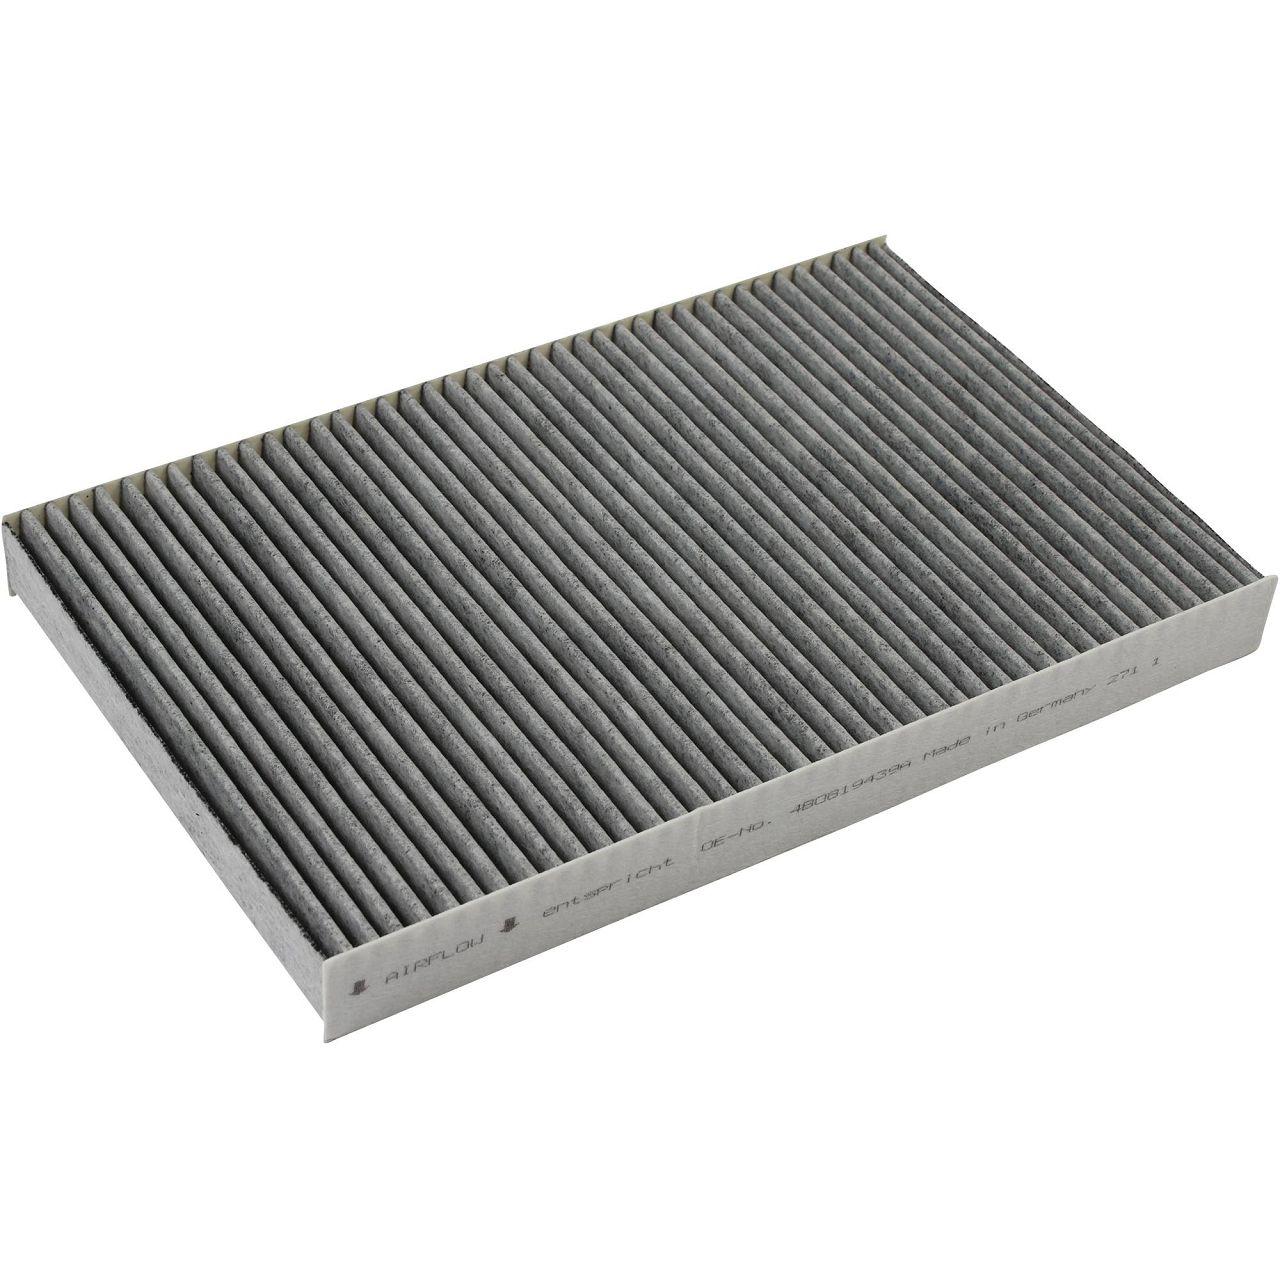 Inspektionskit Filterpaket Filterset für Audi A4 (8E B7) 1.8T quattro 163 PS